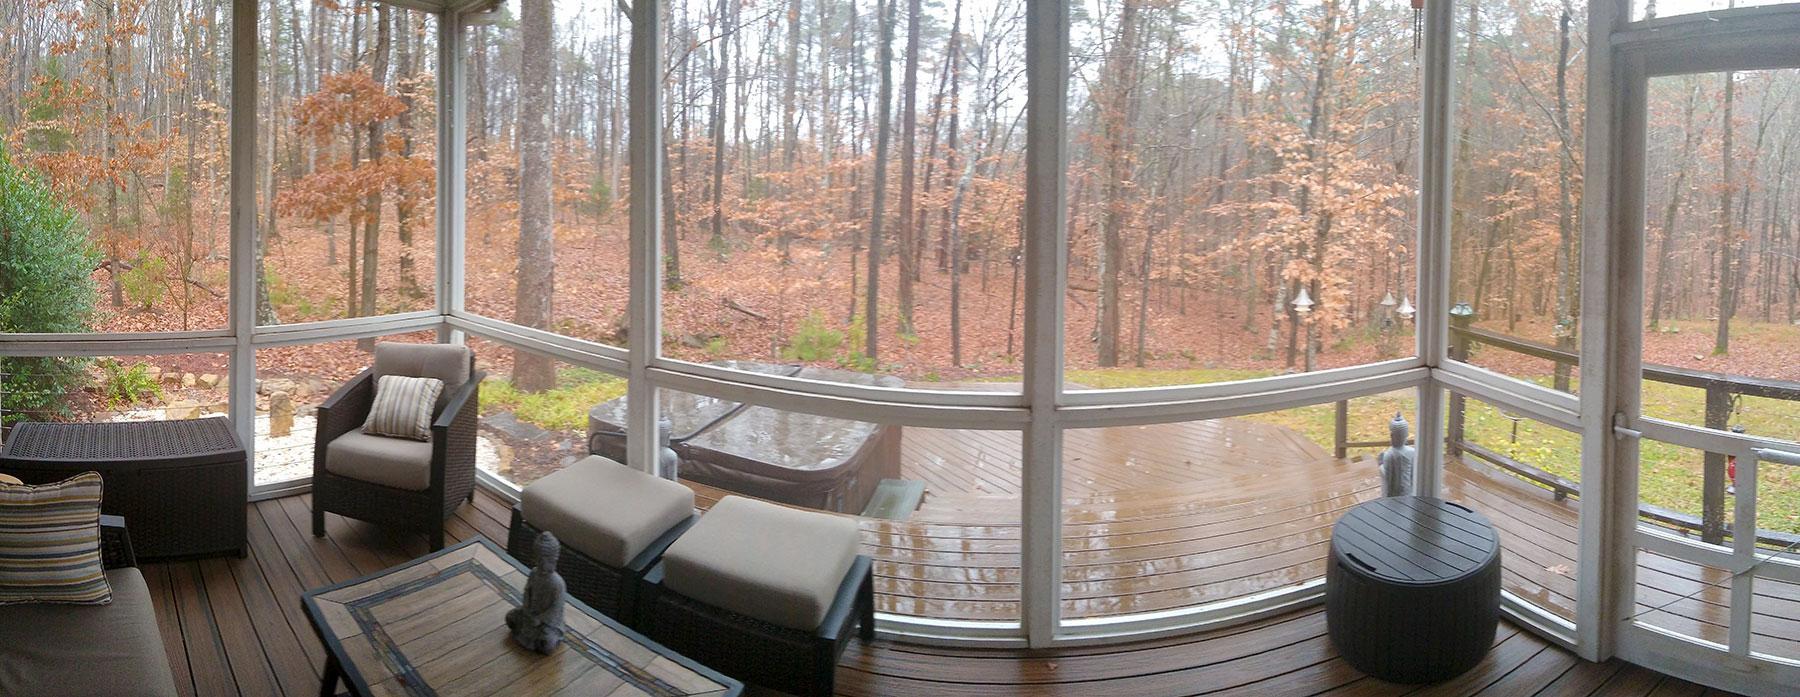 Rainy-Porch.jpg